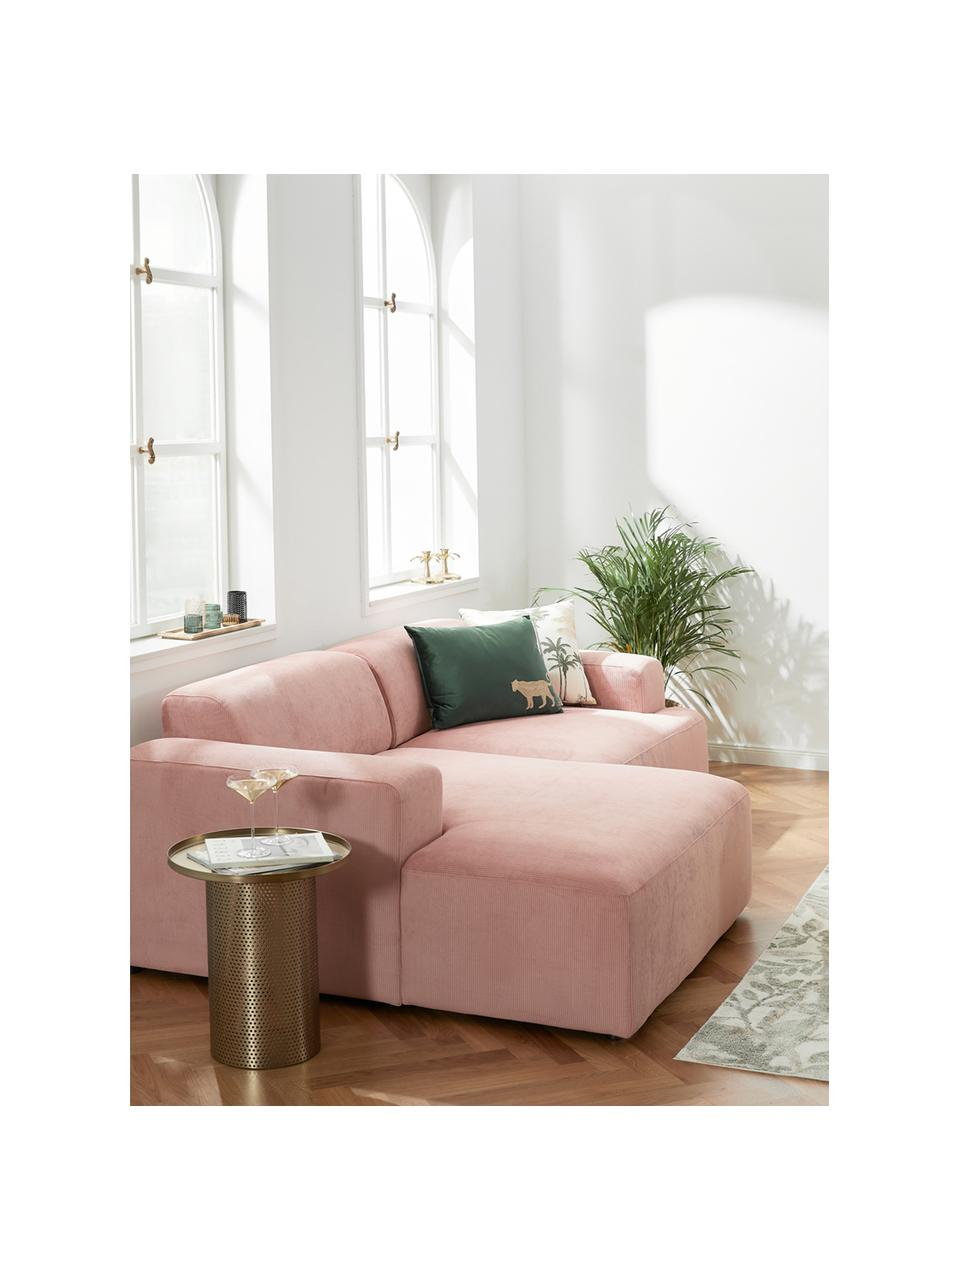 Corduroyhoekbank Melva (3-zits) in roze, Bekleding: Koord (92% polyester, 8% , Frame: massief grenenhout, spaan, Poten: grenenhout De poten bevin, Roze, B 240 x D 144 cm